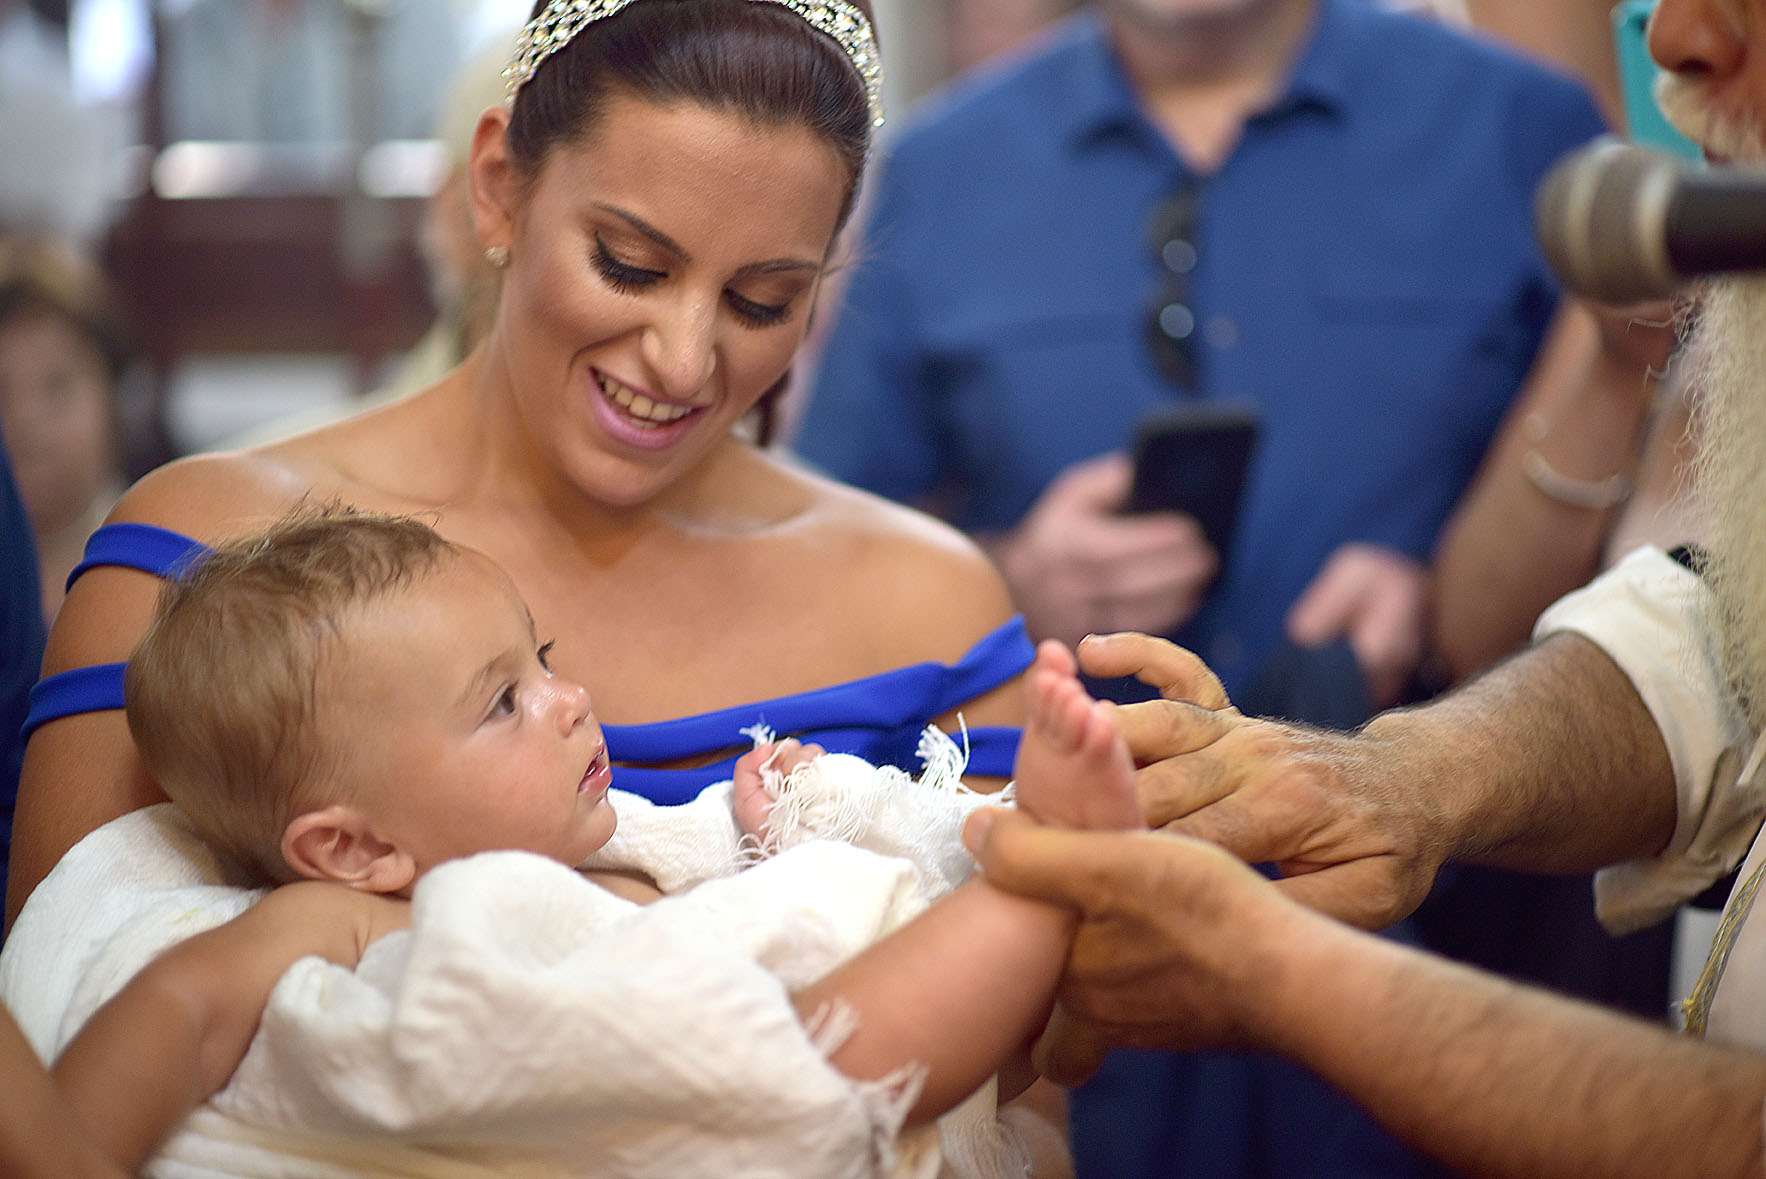 panagia-siriotissa-kampos-chios-christening-baptism-alexis-koumaditis-photography-20